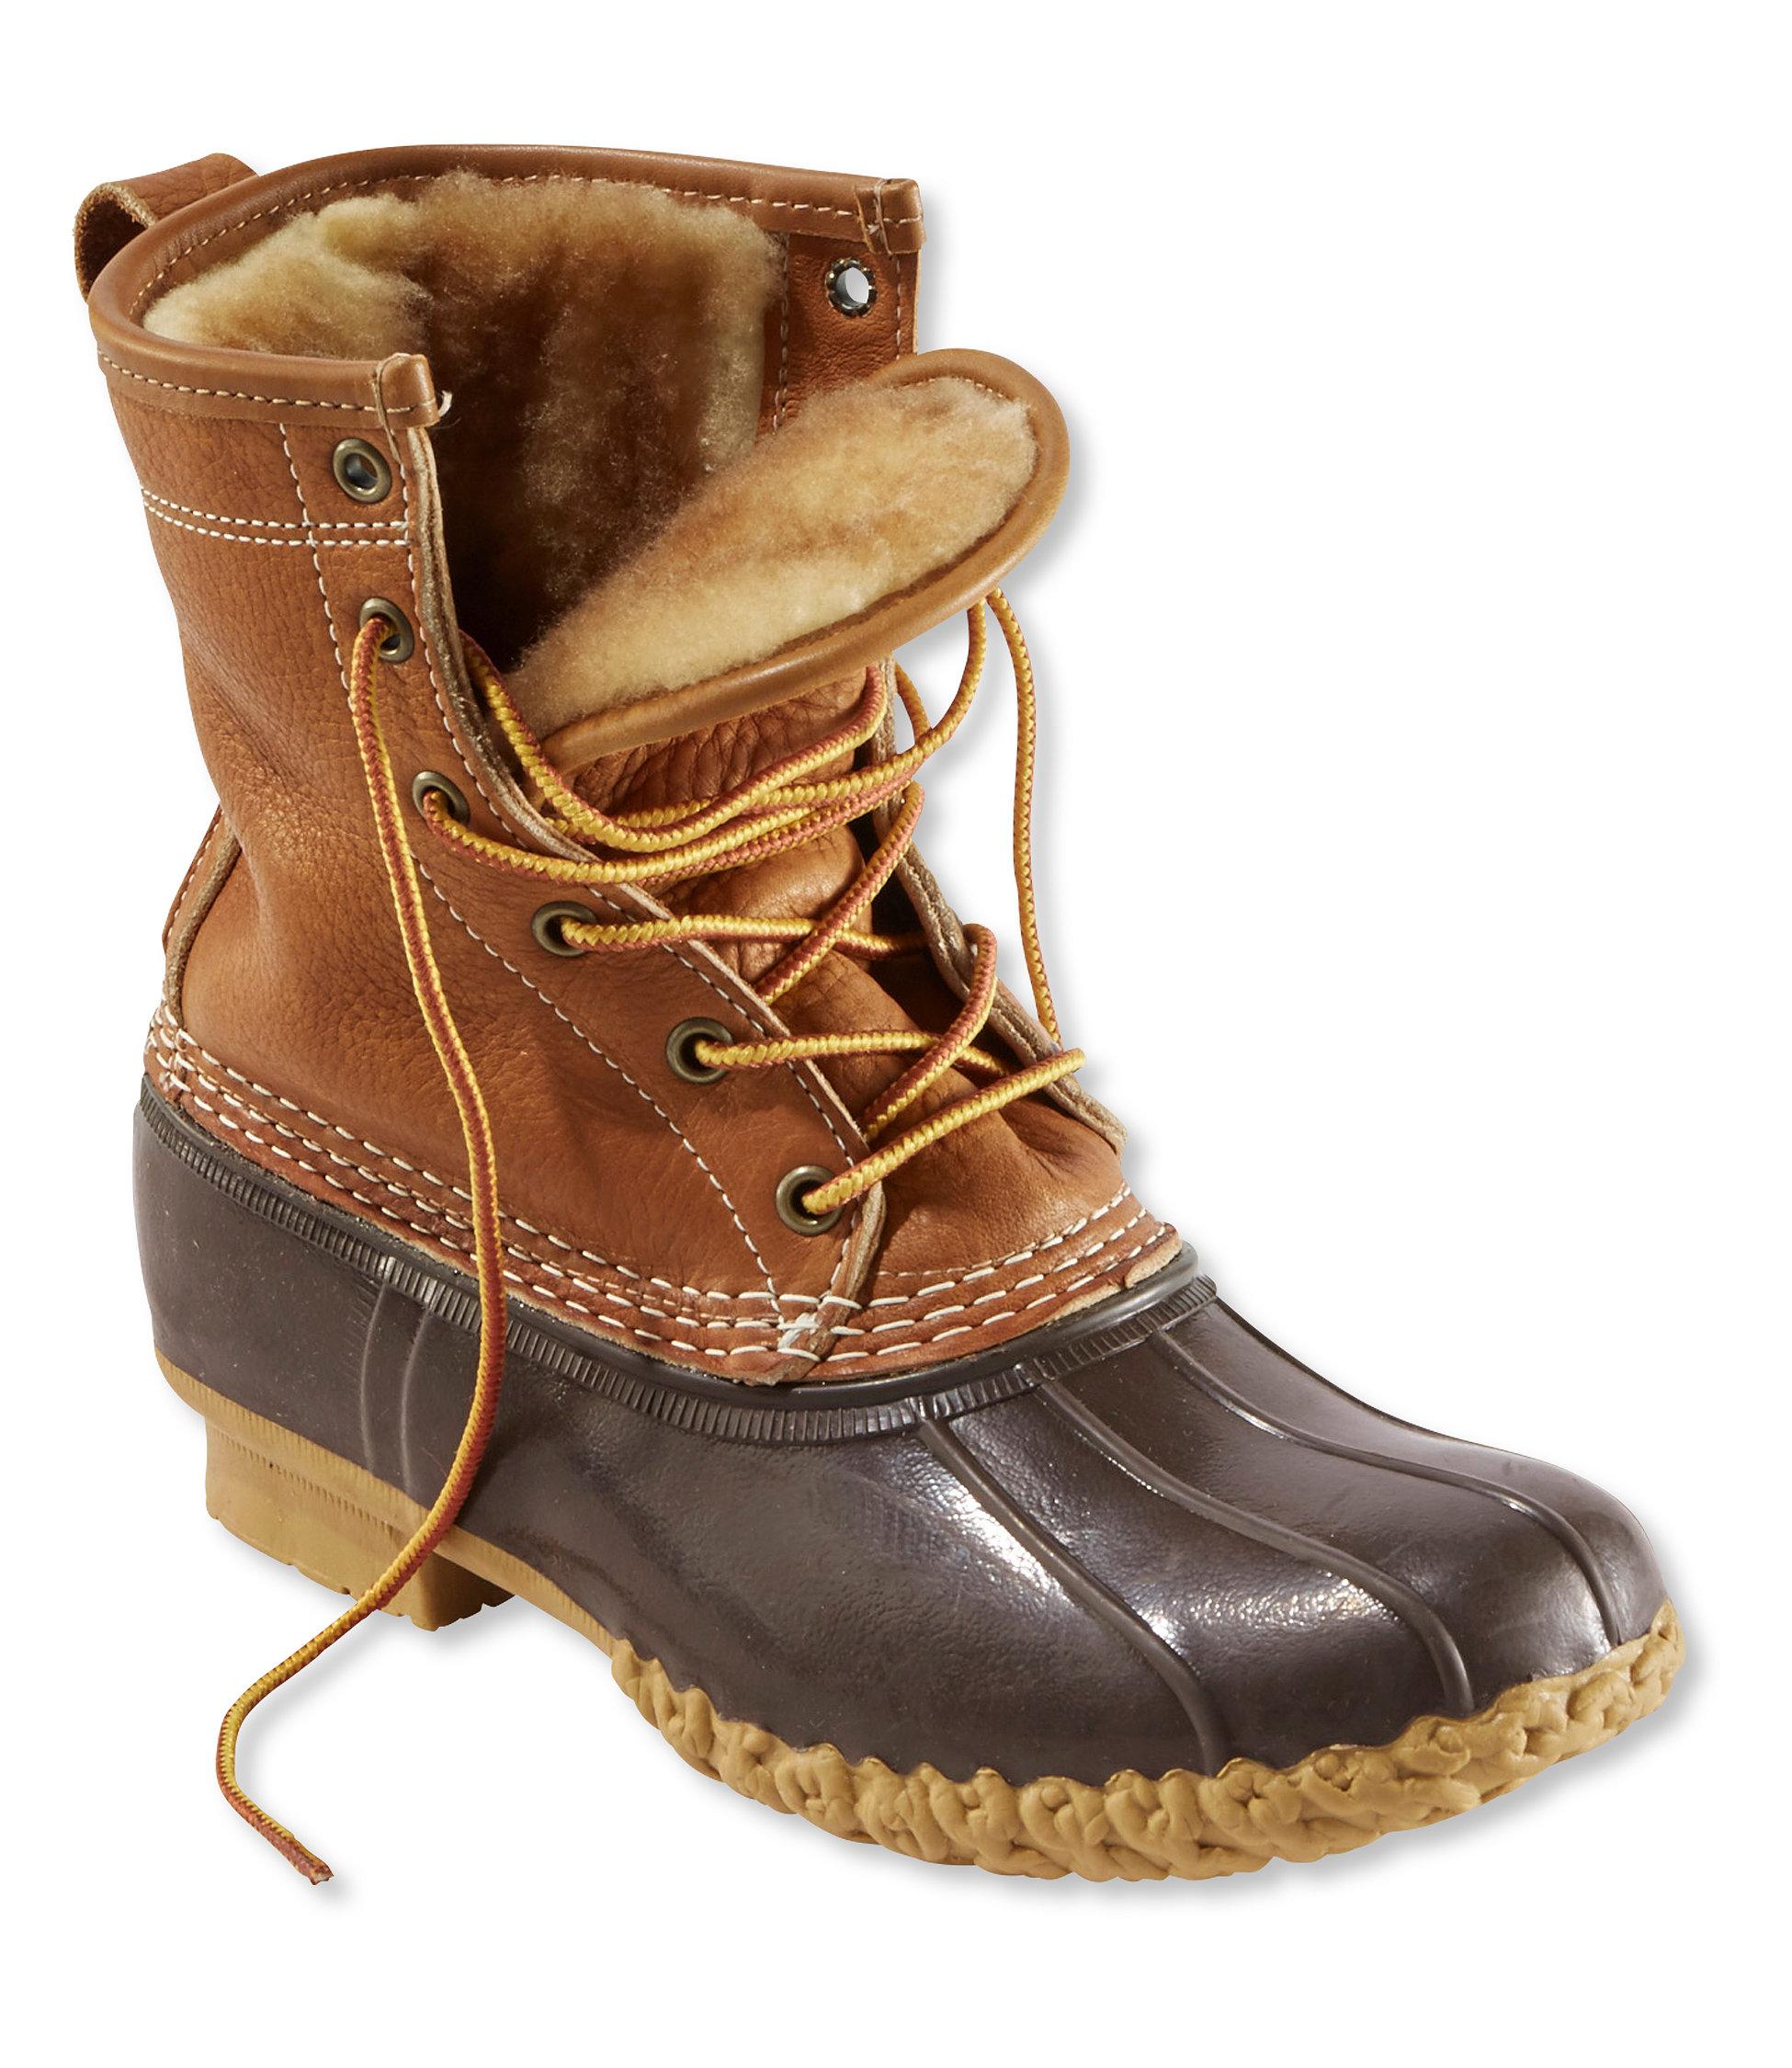 duck boots womenu0027s l.l.bean boots, 8 BITUFVW